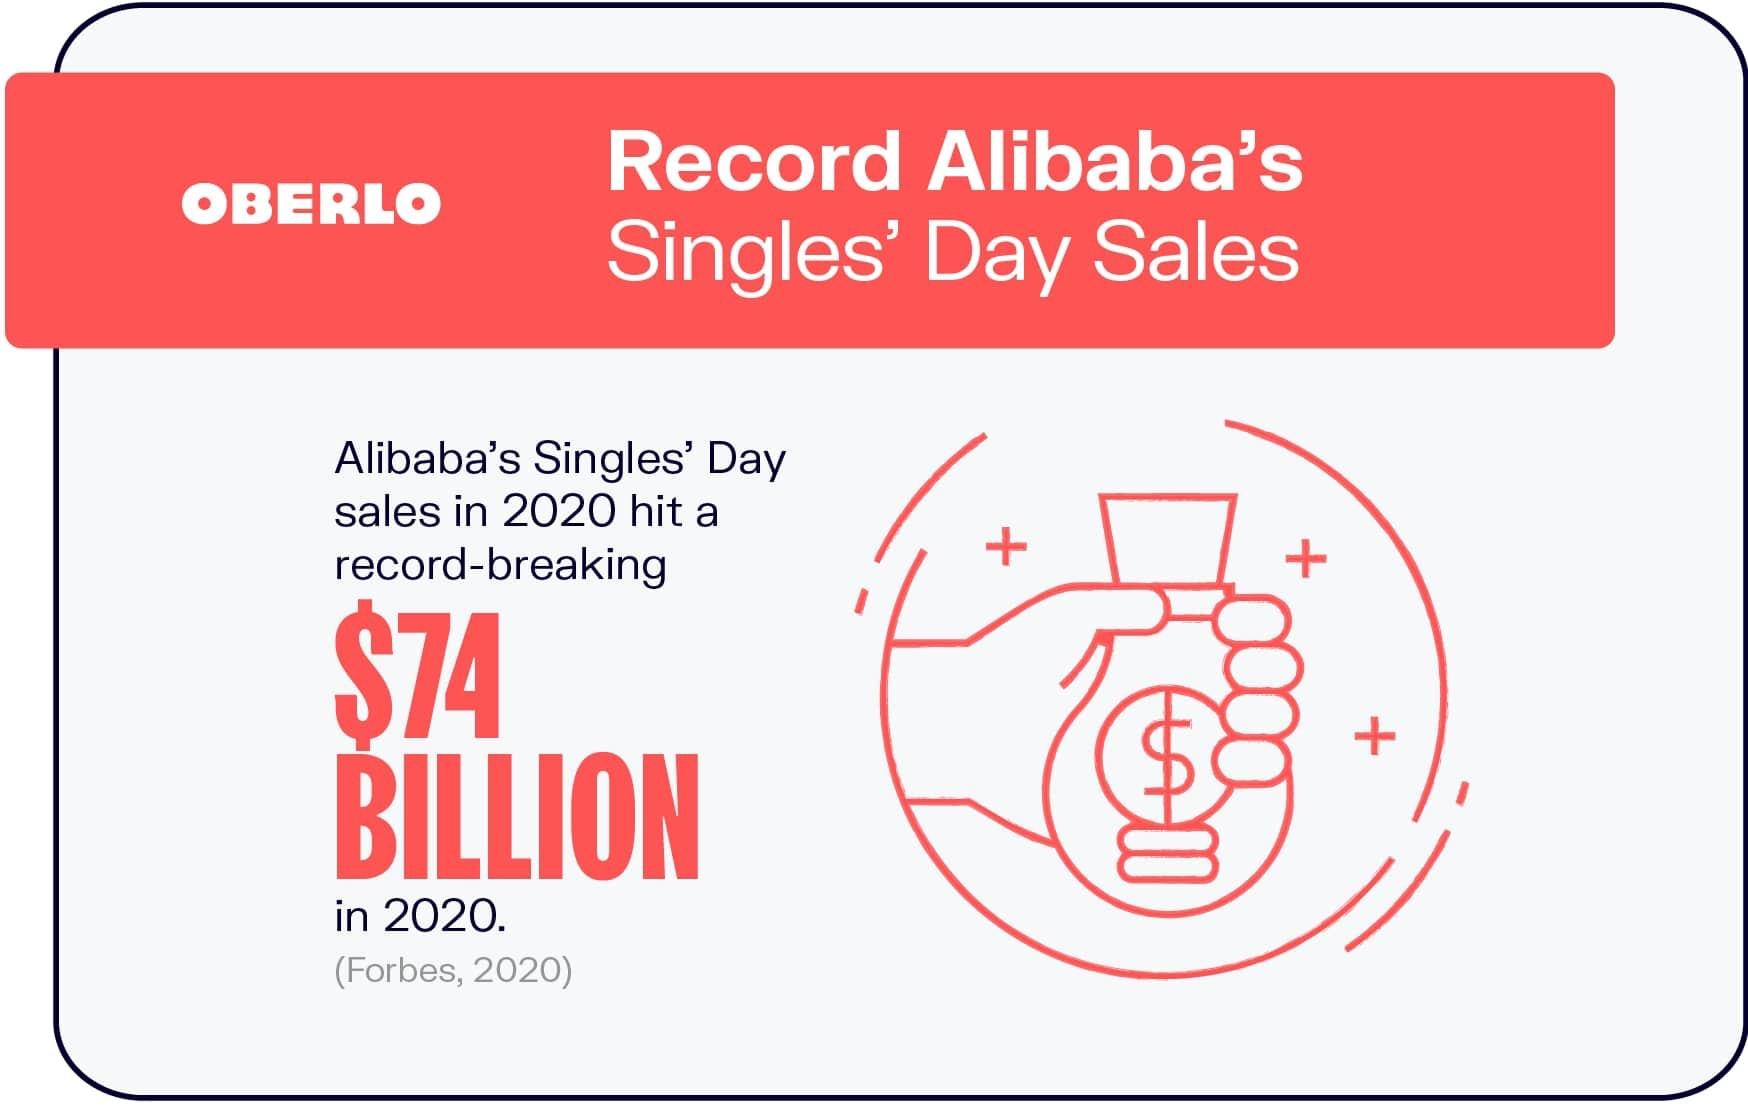 Record Alibaba's Singles' Day Sales